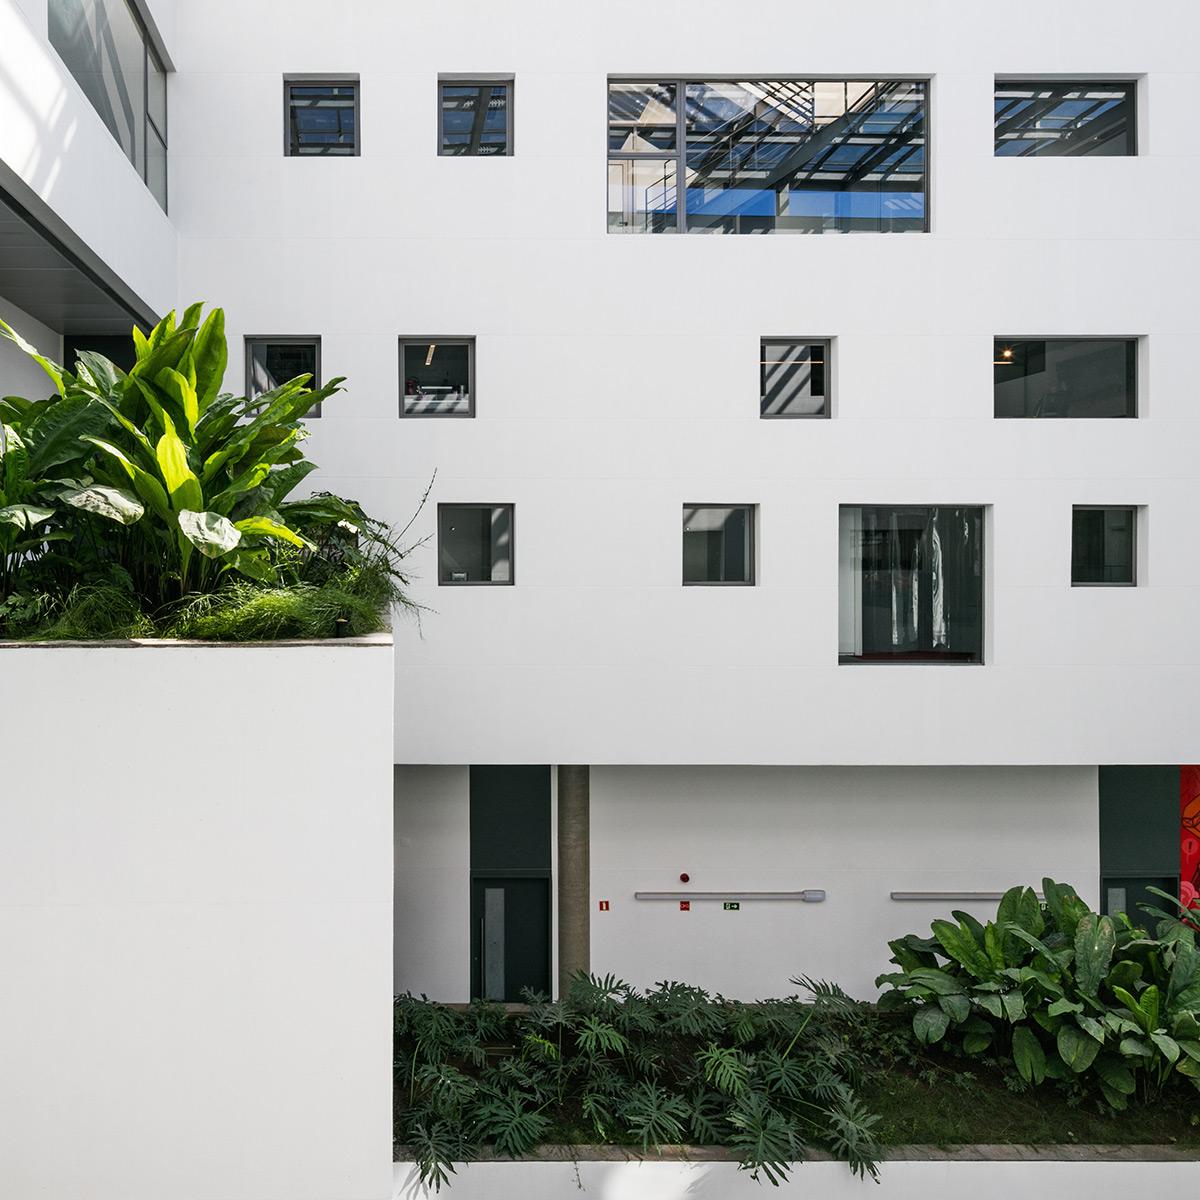 Modulo-Reboucas-Dal-Pian-Arquitetos-Nelson-Kon-04